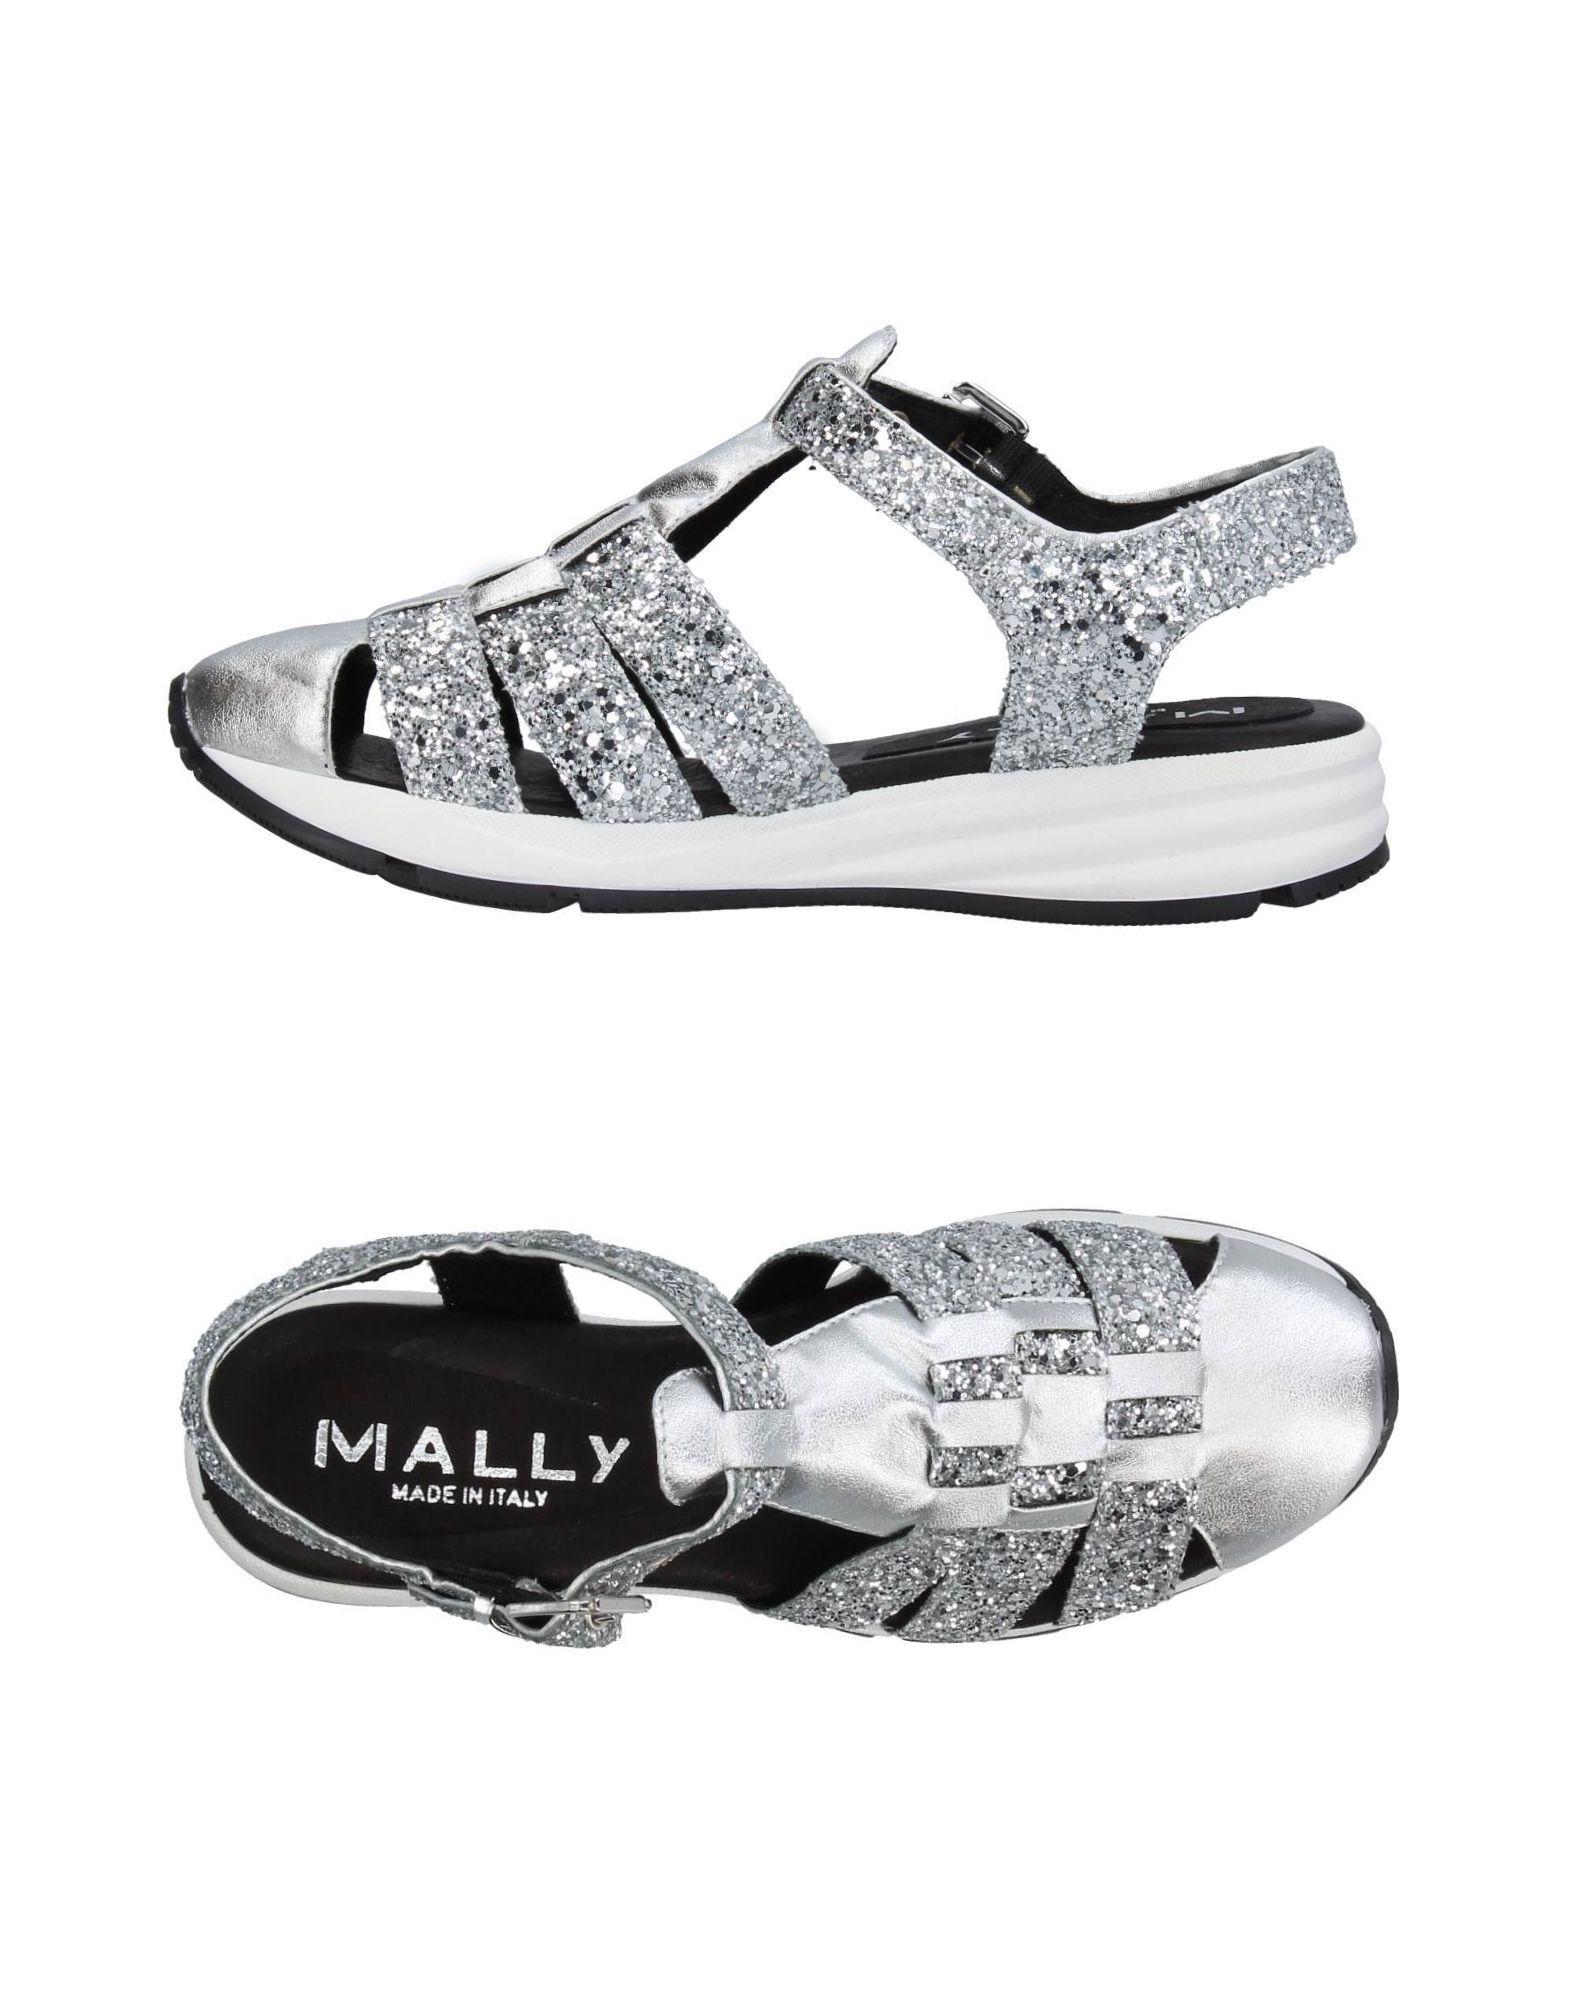 Sandales Mally Femme - Sandales Mally sur